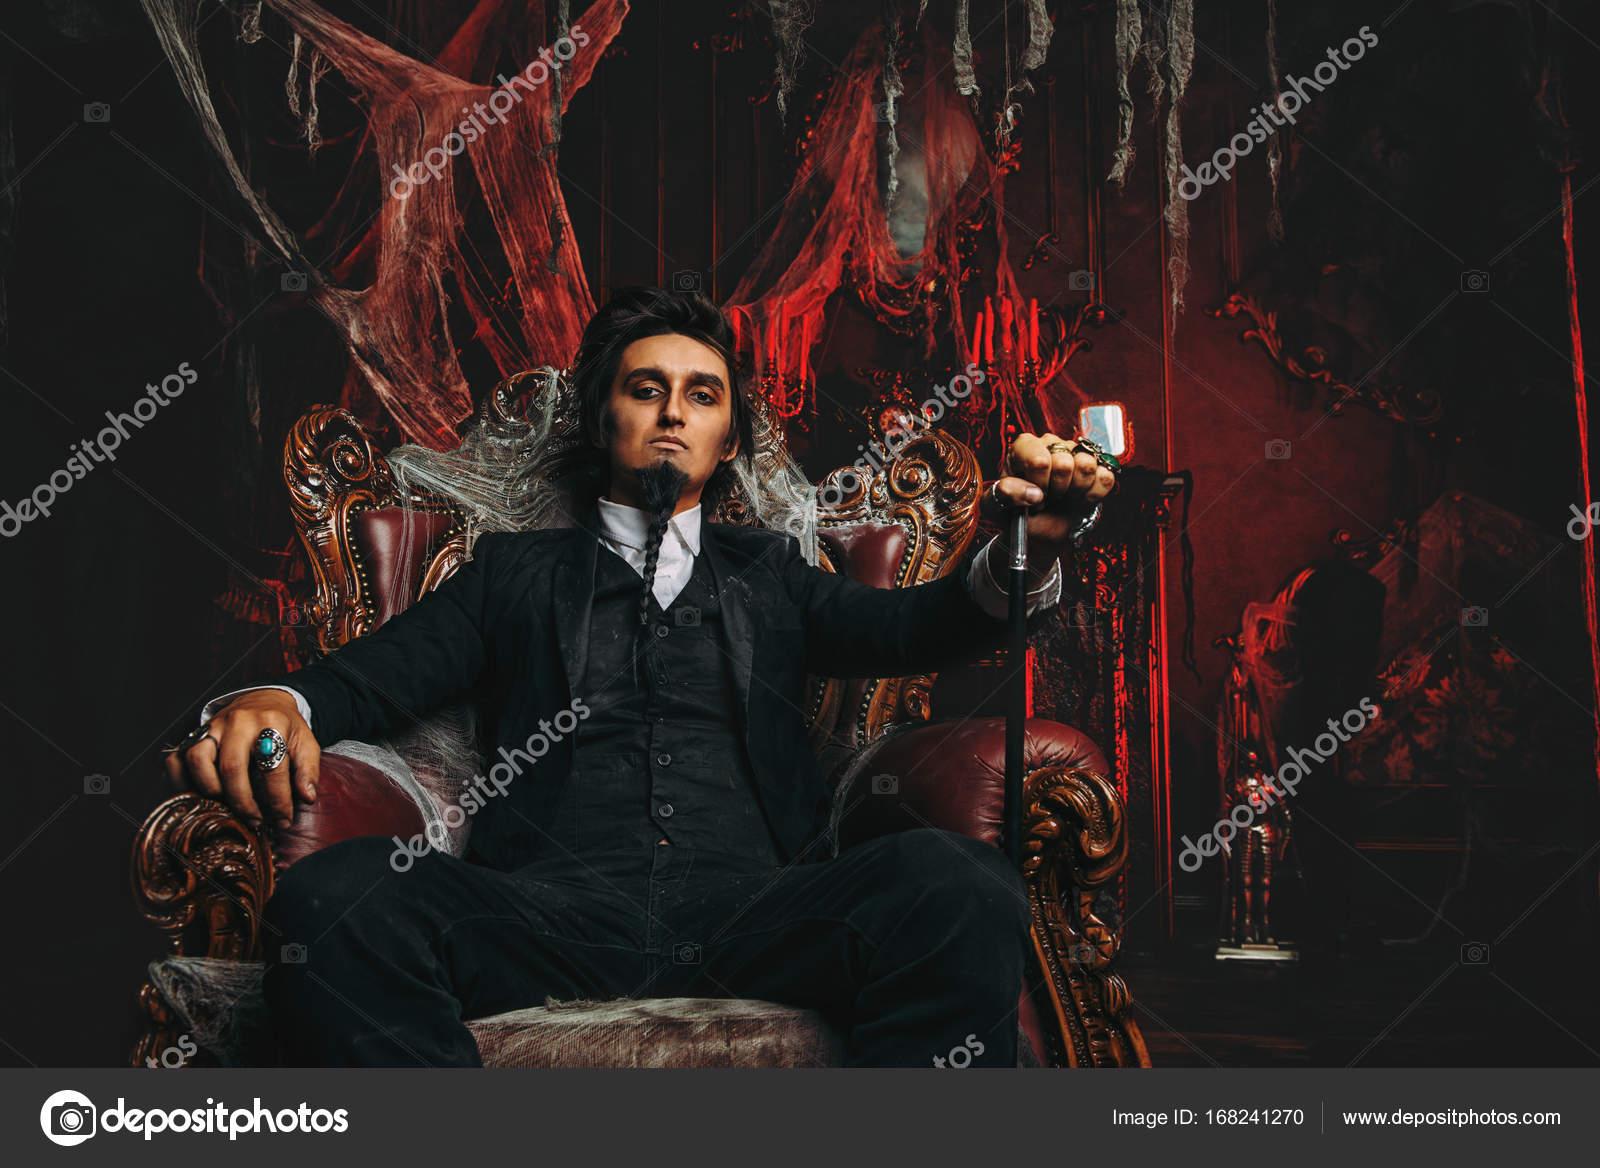 Dark Lord on Throne